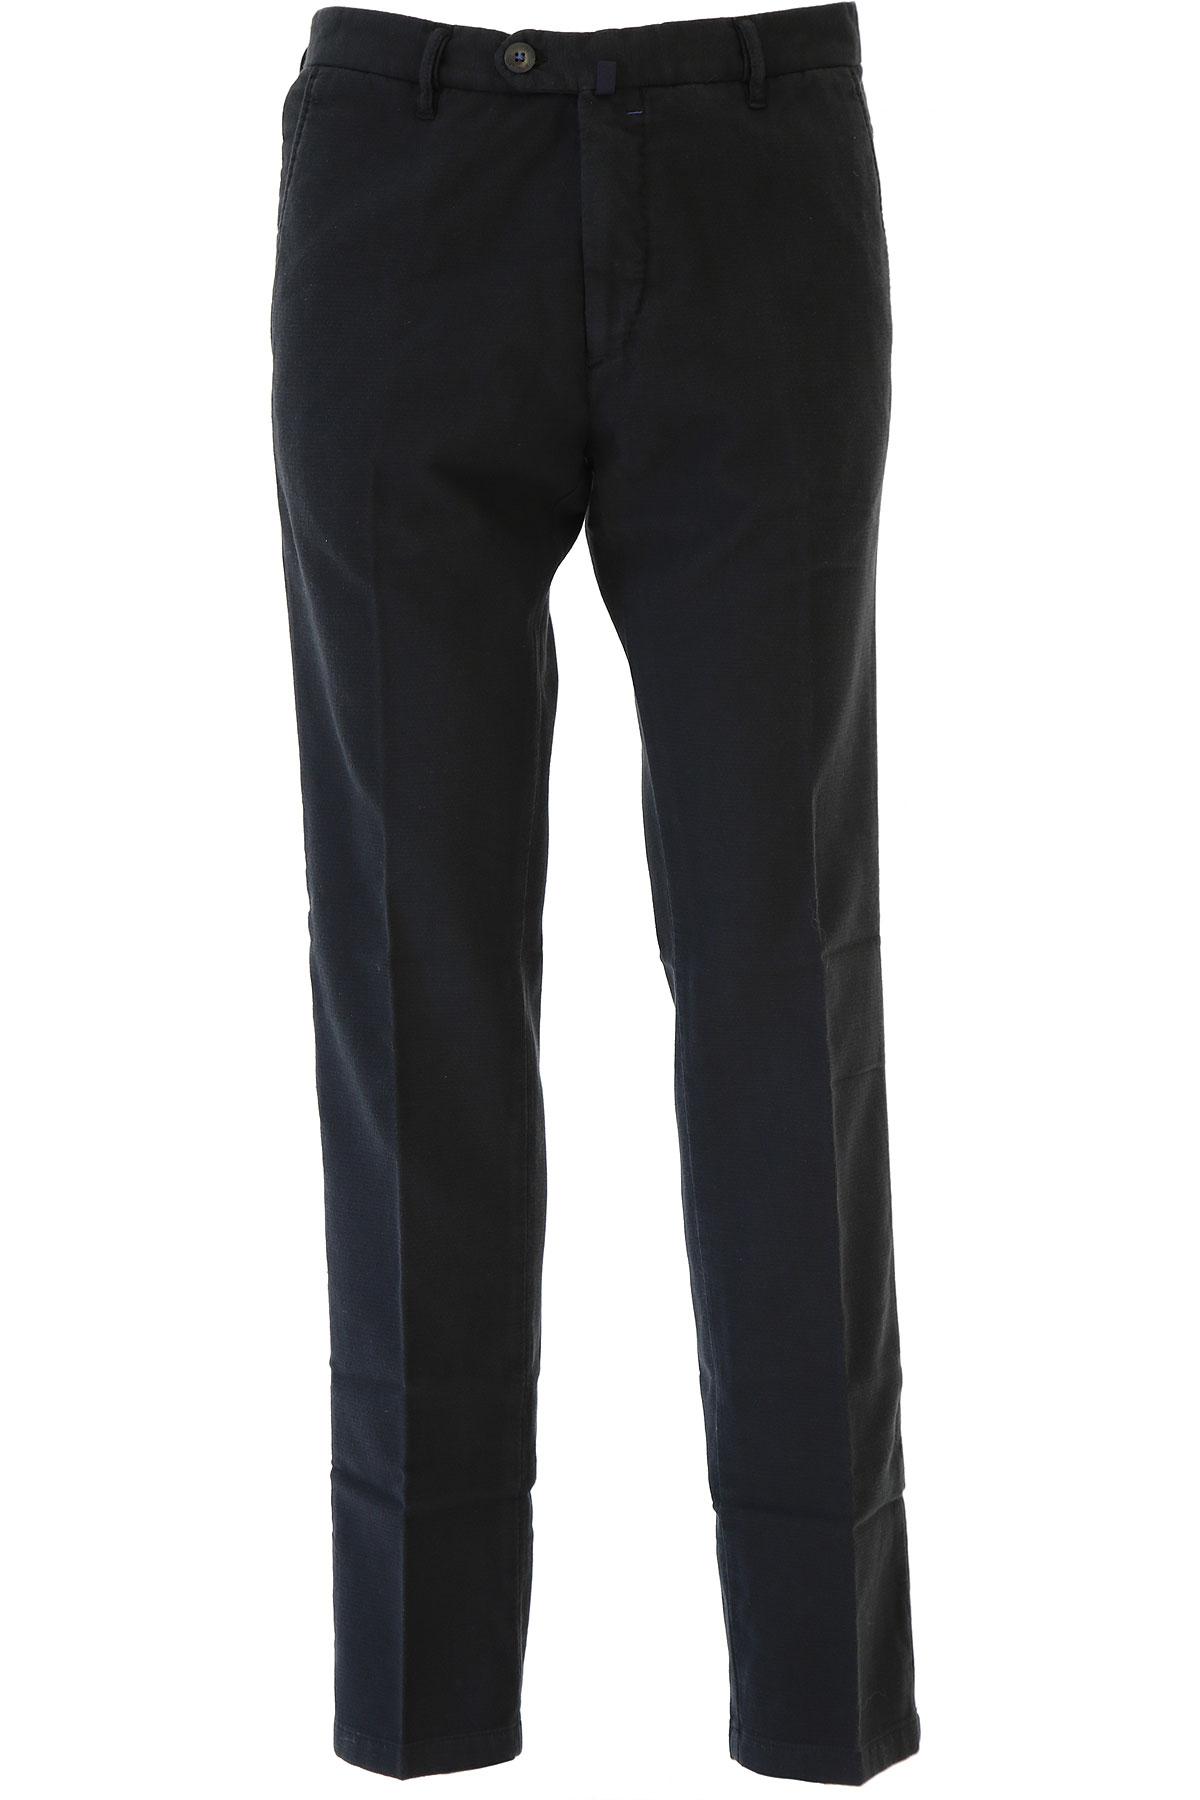 Image of J.W. Brine Pants for Men On Sale, Black, Cotton, 2017, 30 36 38